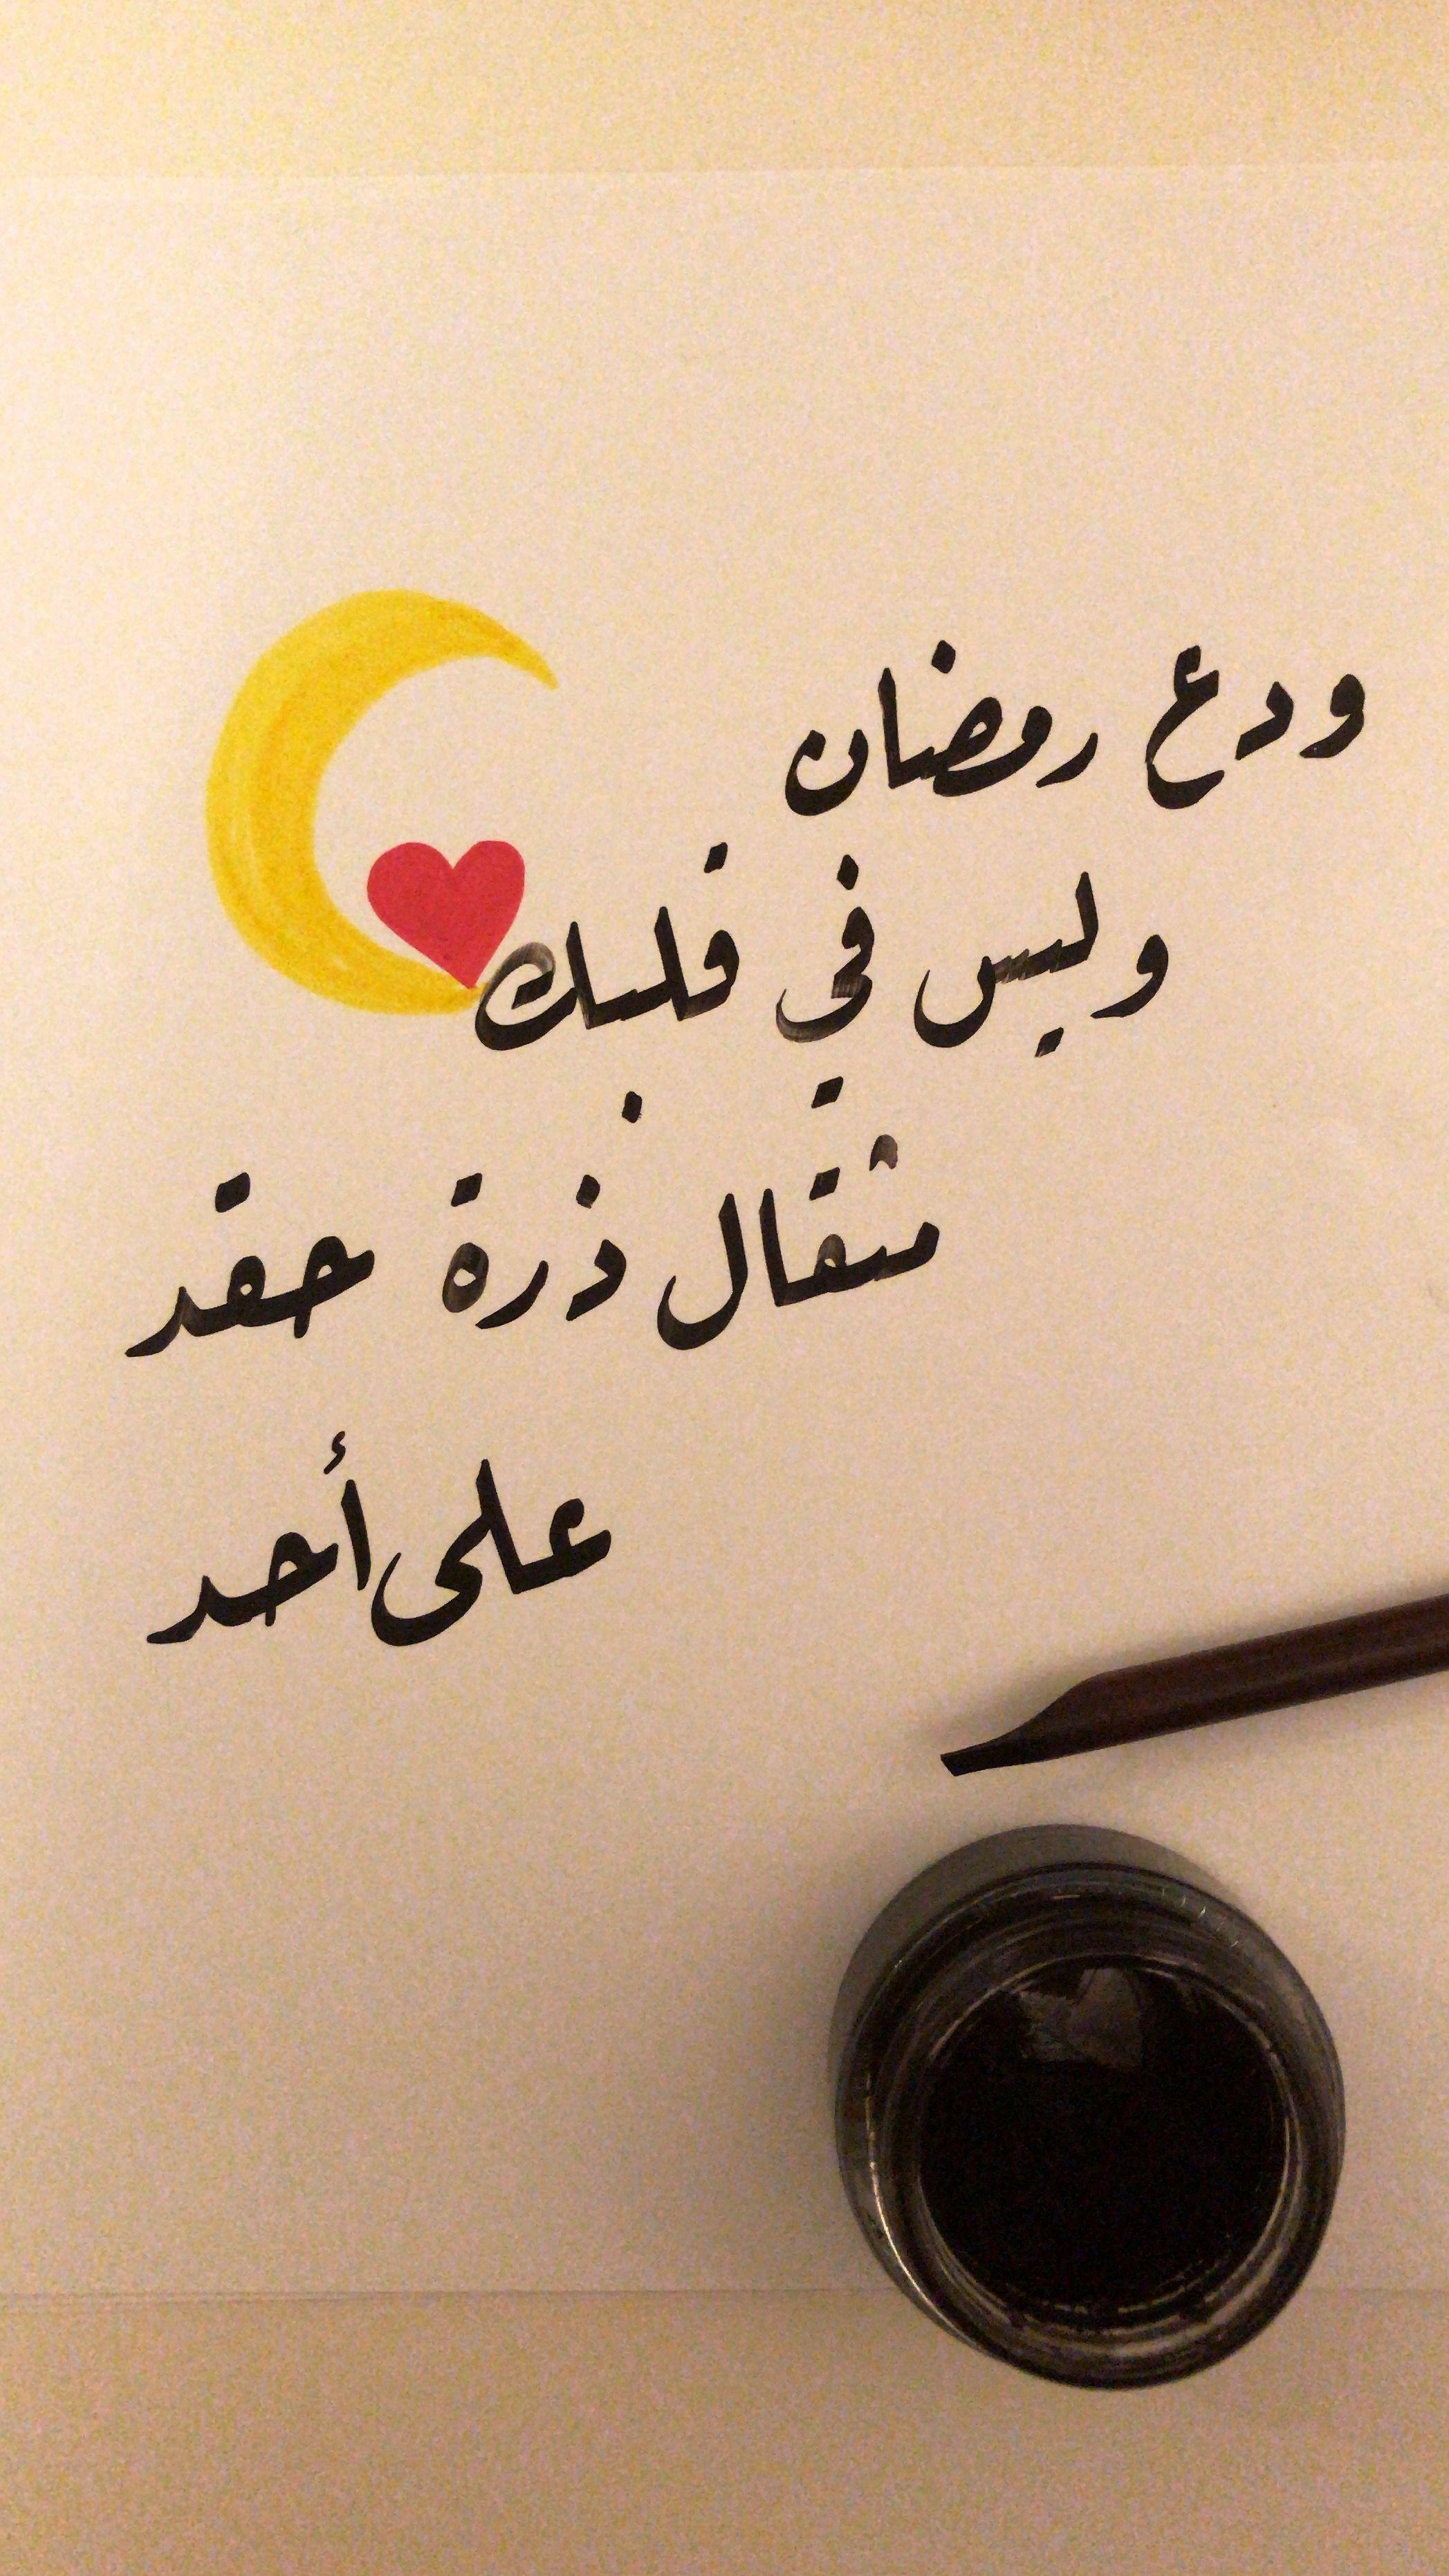 رمضان وداع ختام خط خطي رقعة قلبك Ramadan Quotes